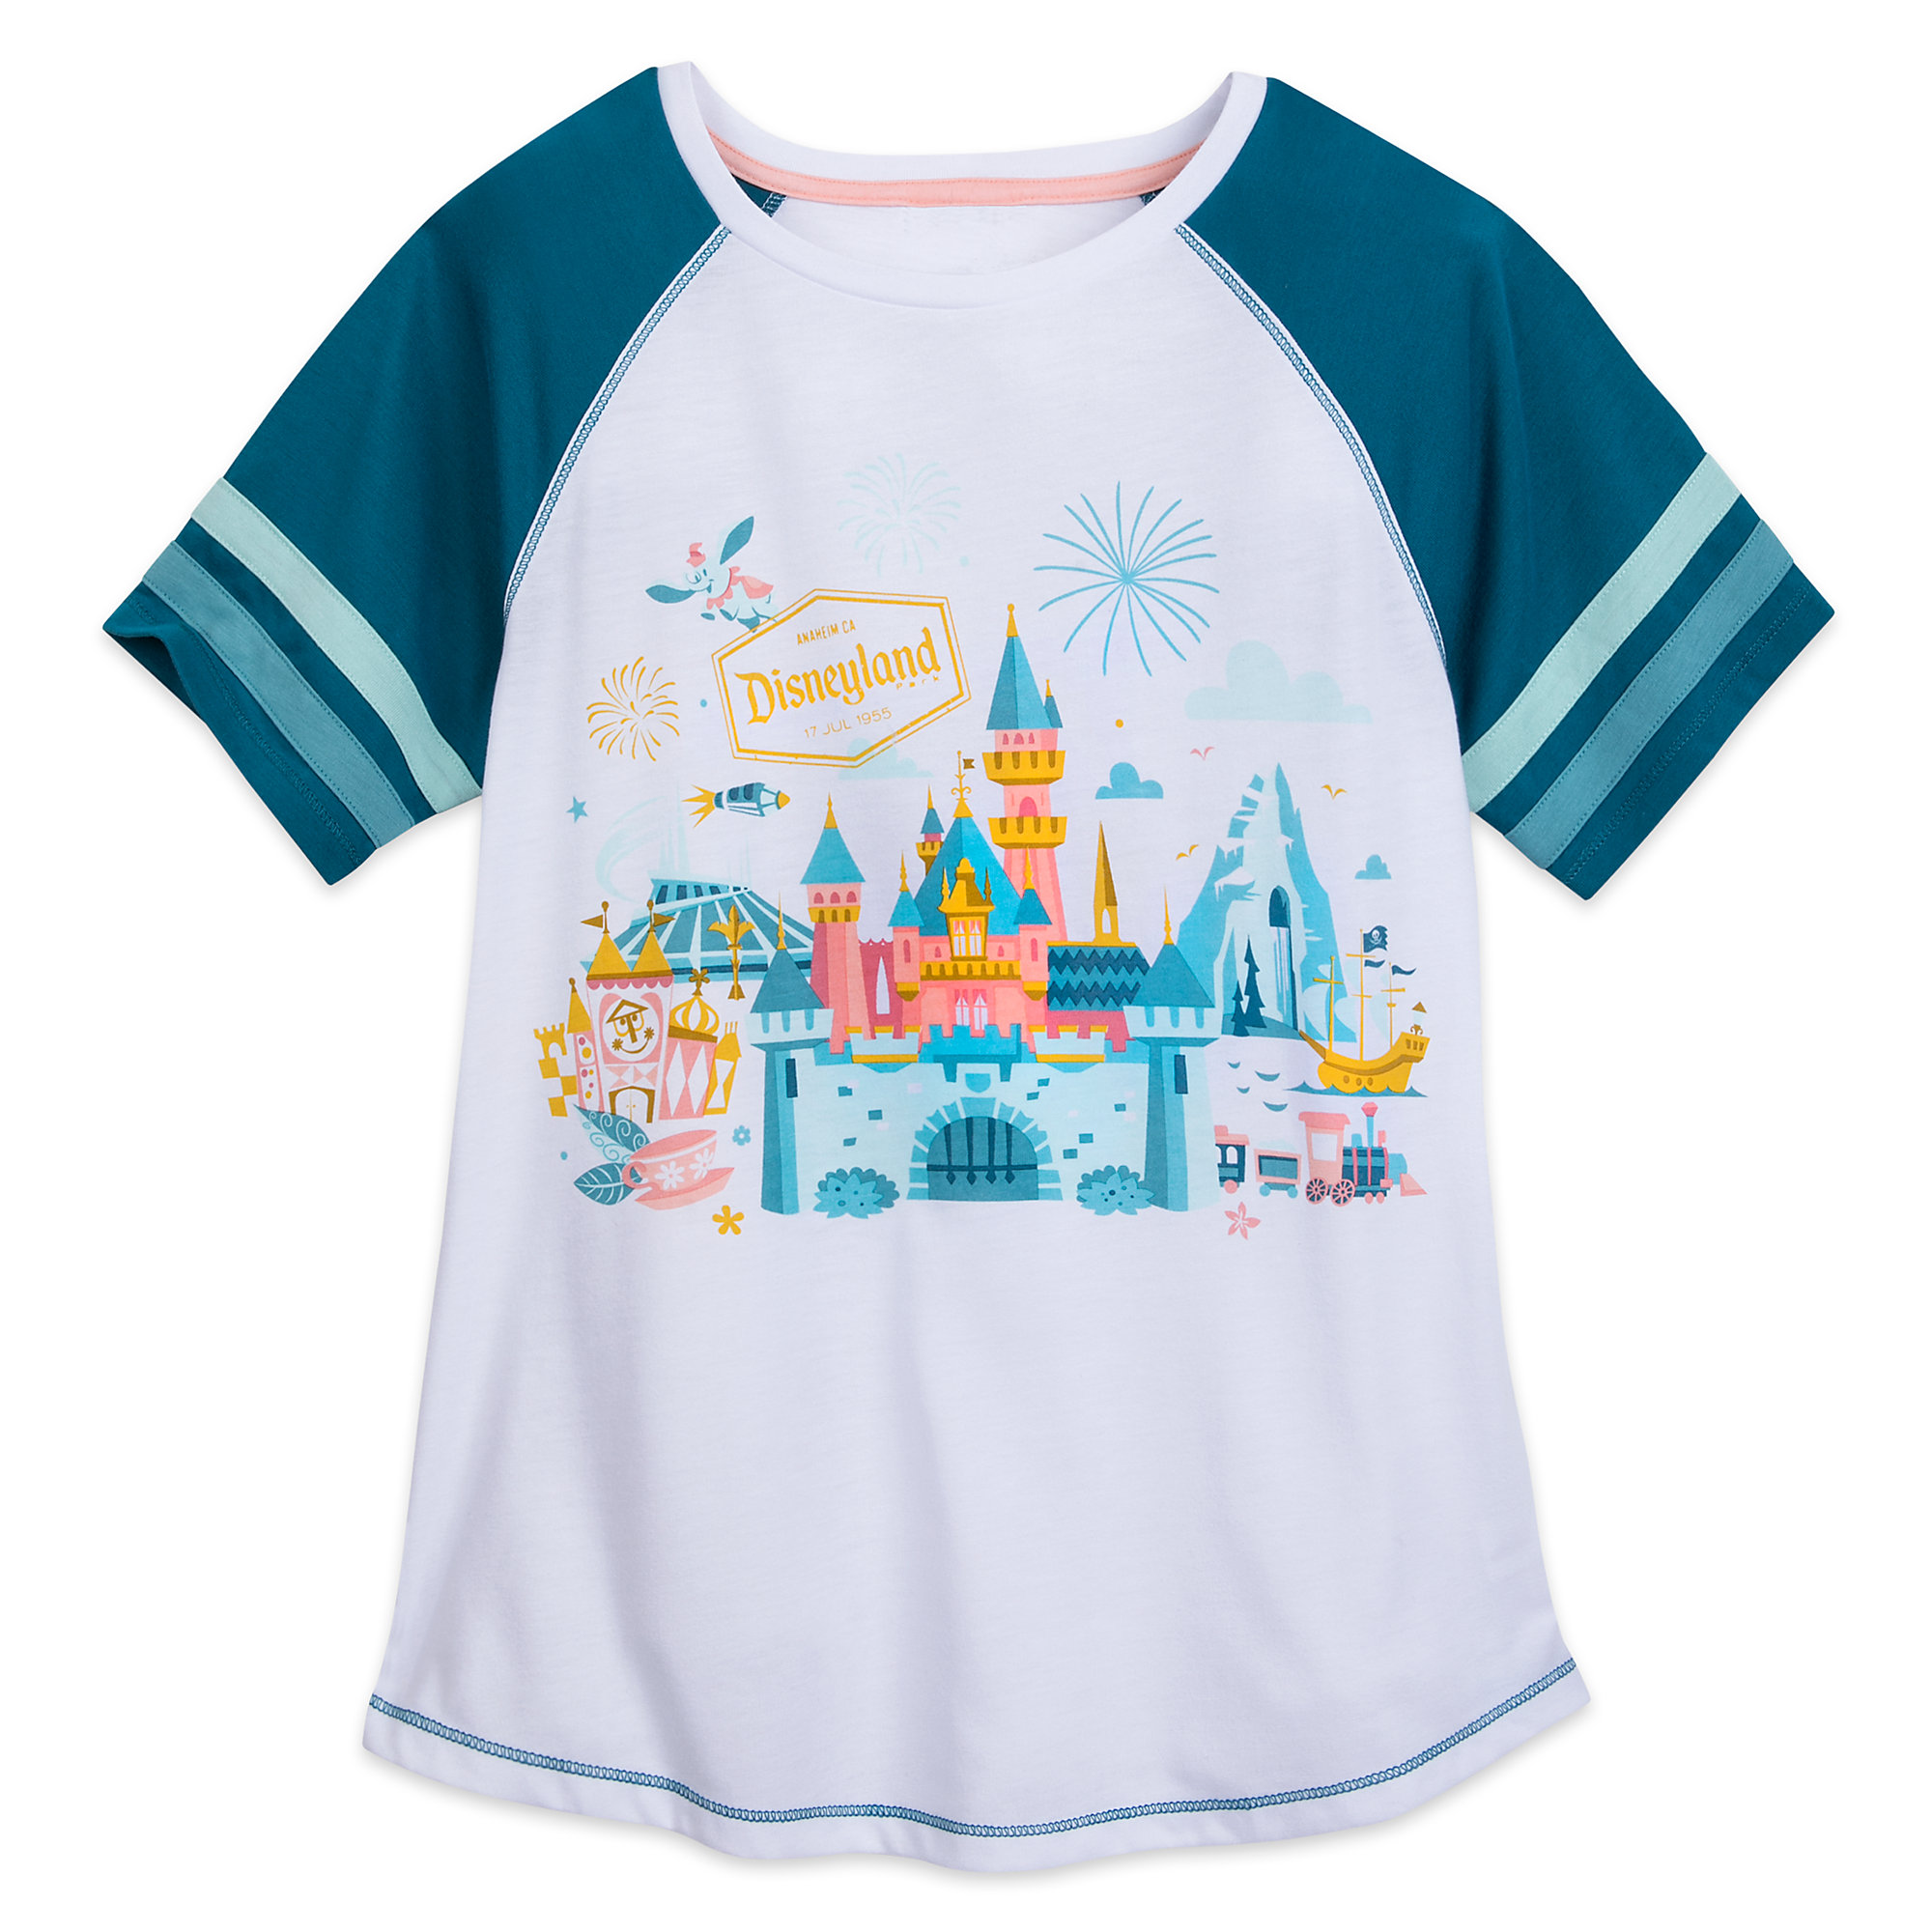 Disneyland Raglan T-Shirt for Women